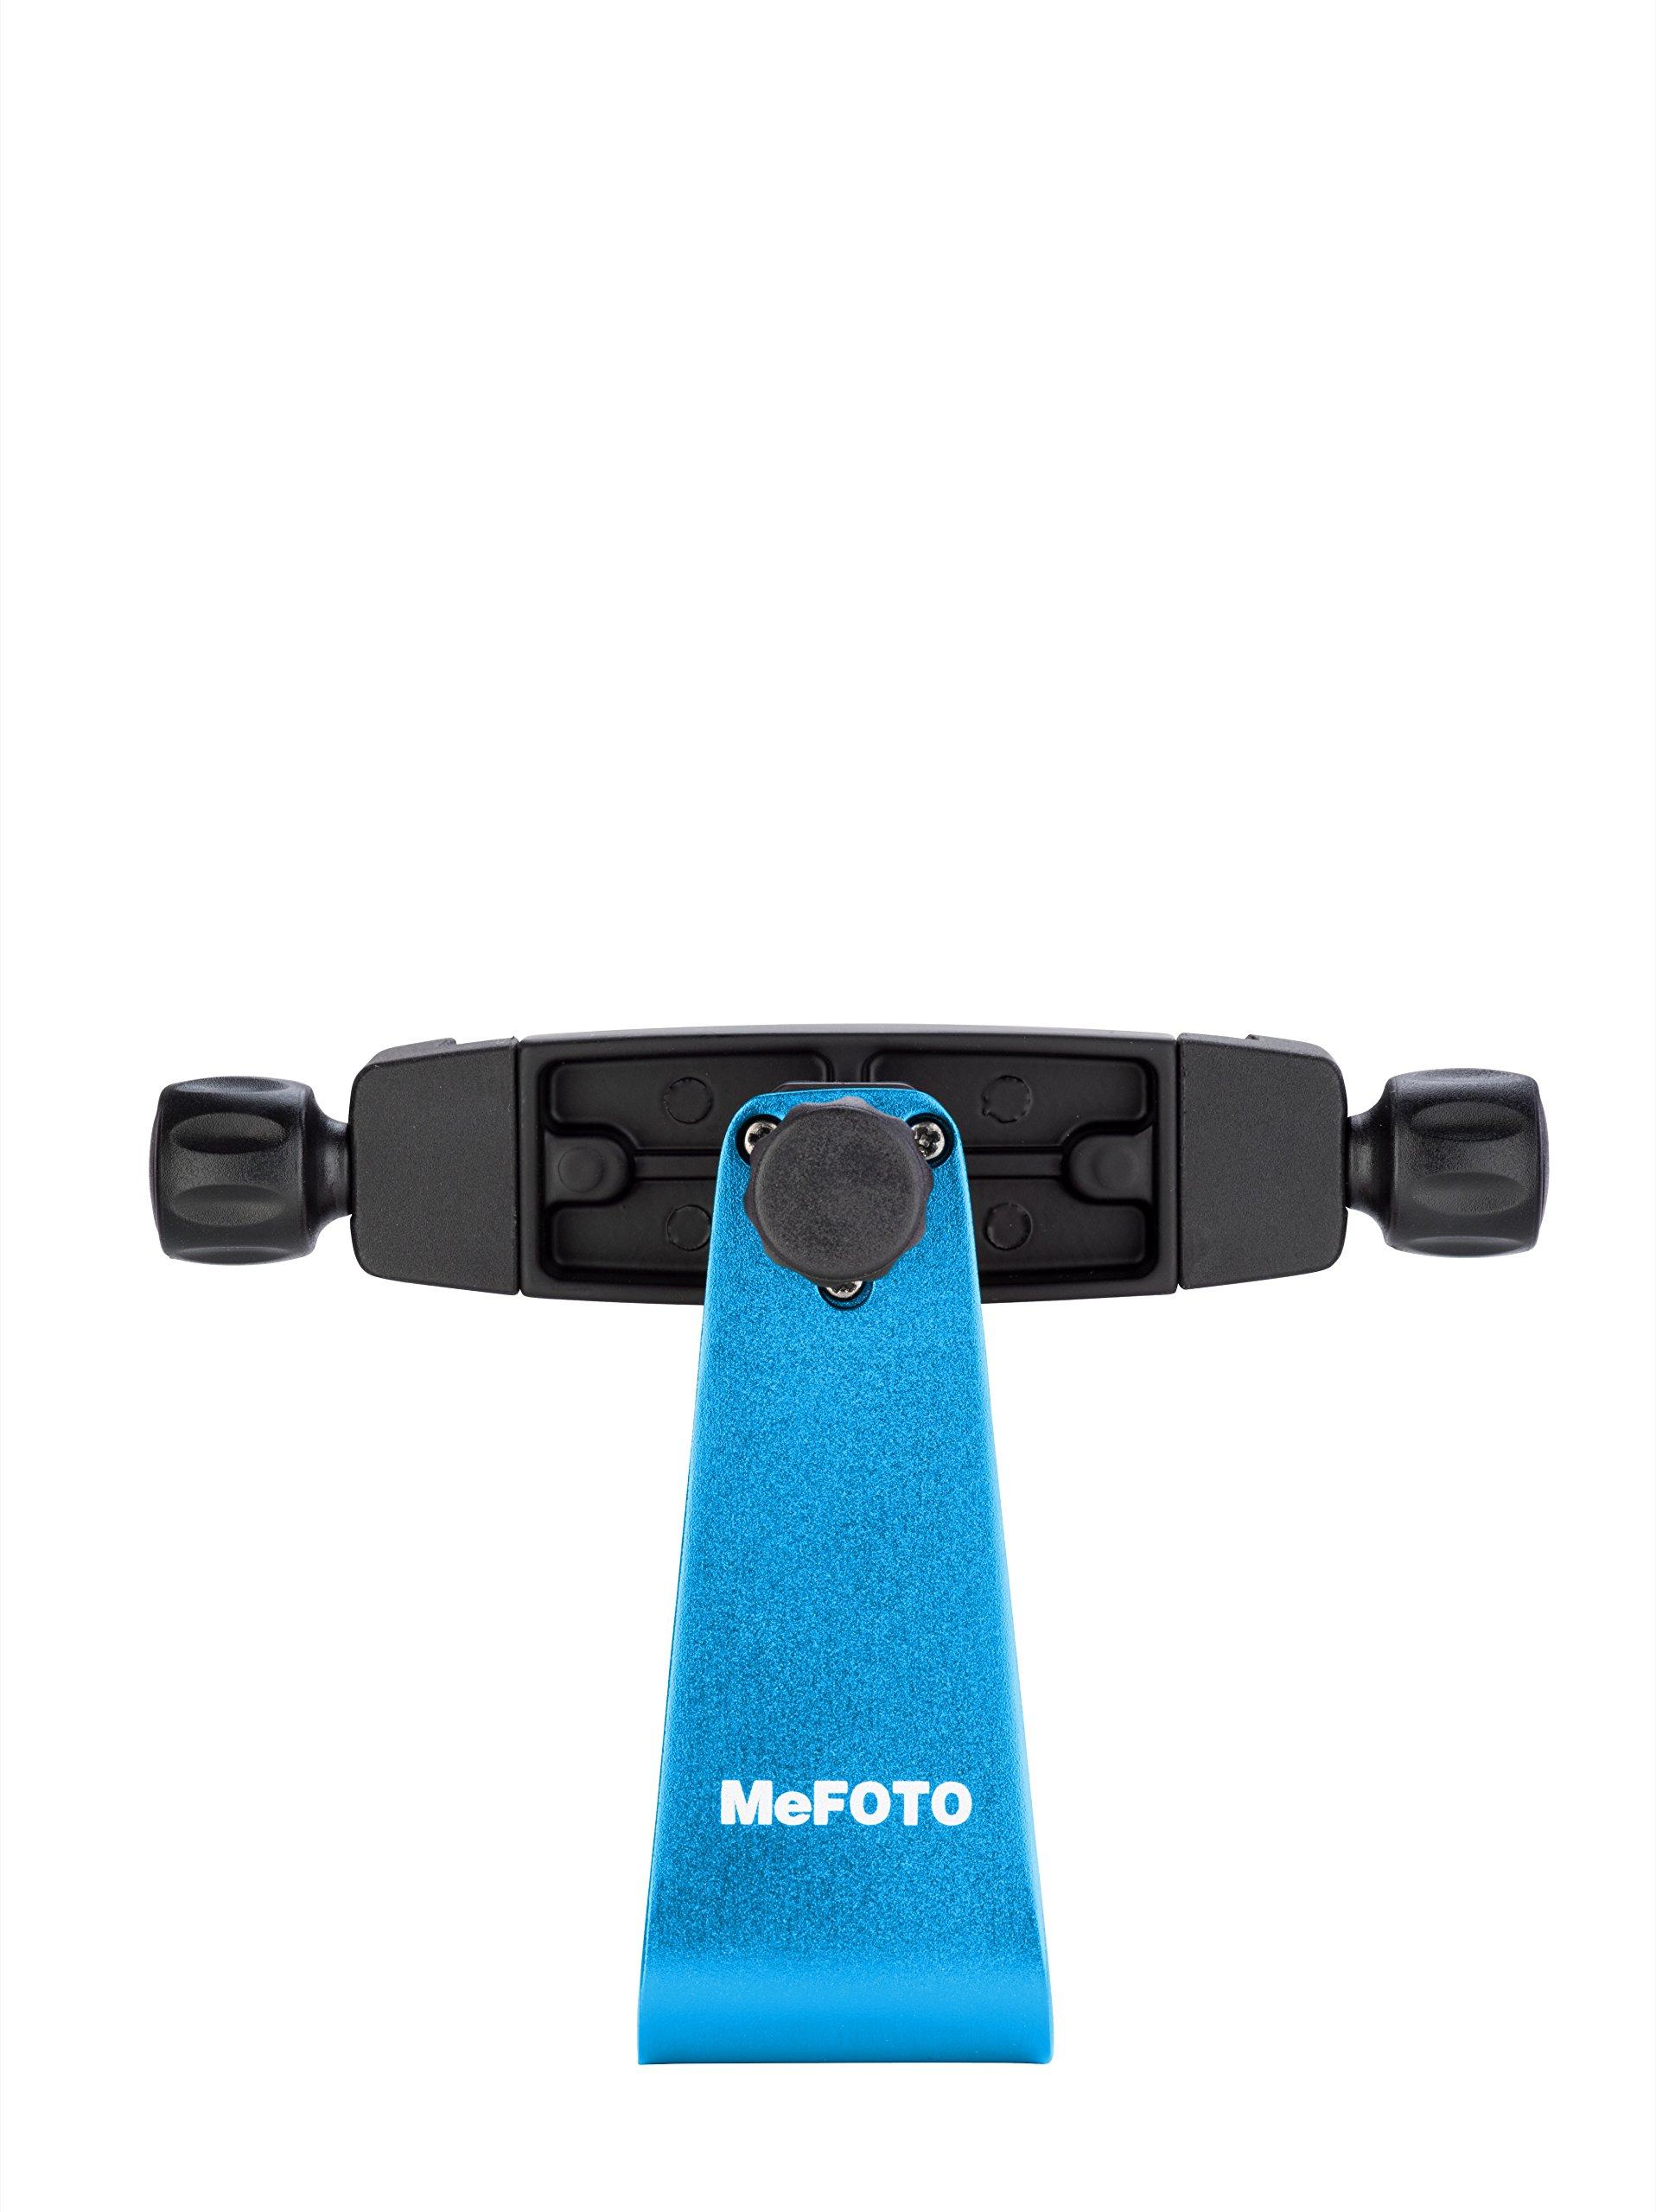 MeFoto SideKick360 Plus Smartphone Tripod Adapter Large - Blue (MPH200B)